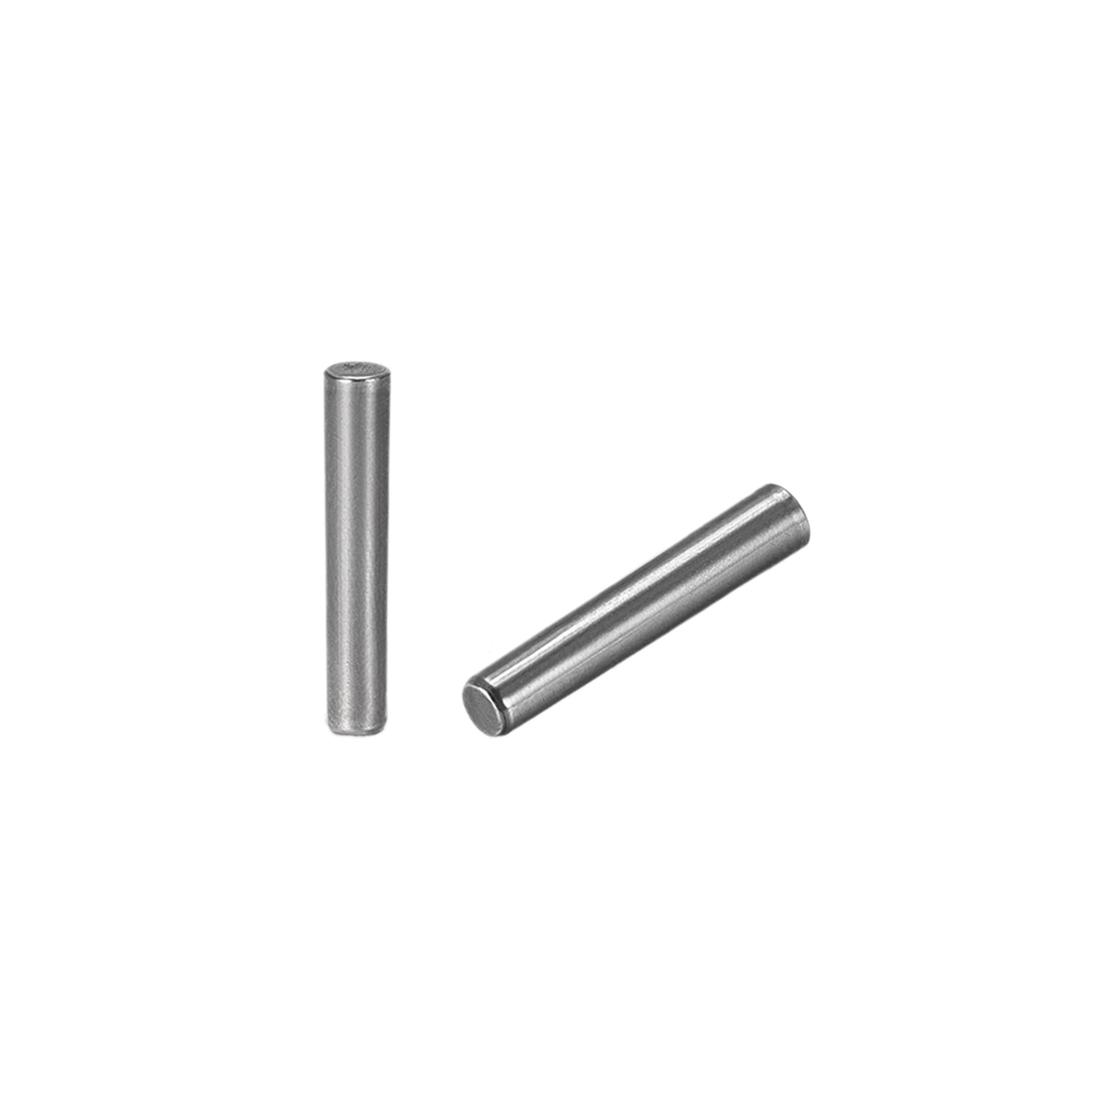 Carbon Steel GB117 25mm Length 4mmx4.5mm Small End Diameter 1:50 Taper Pin 10Pcs